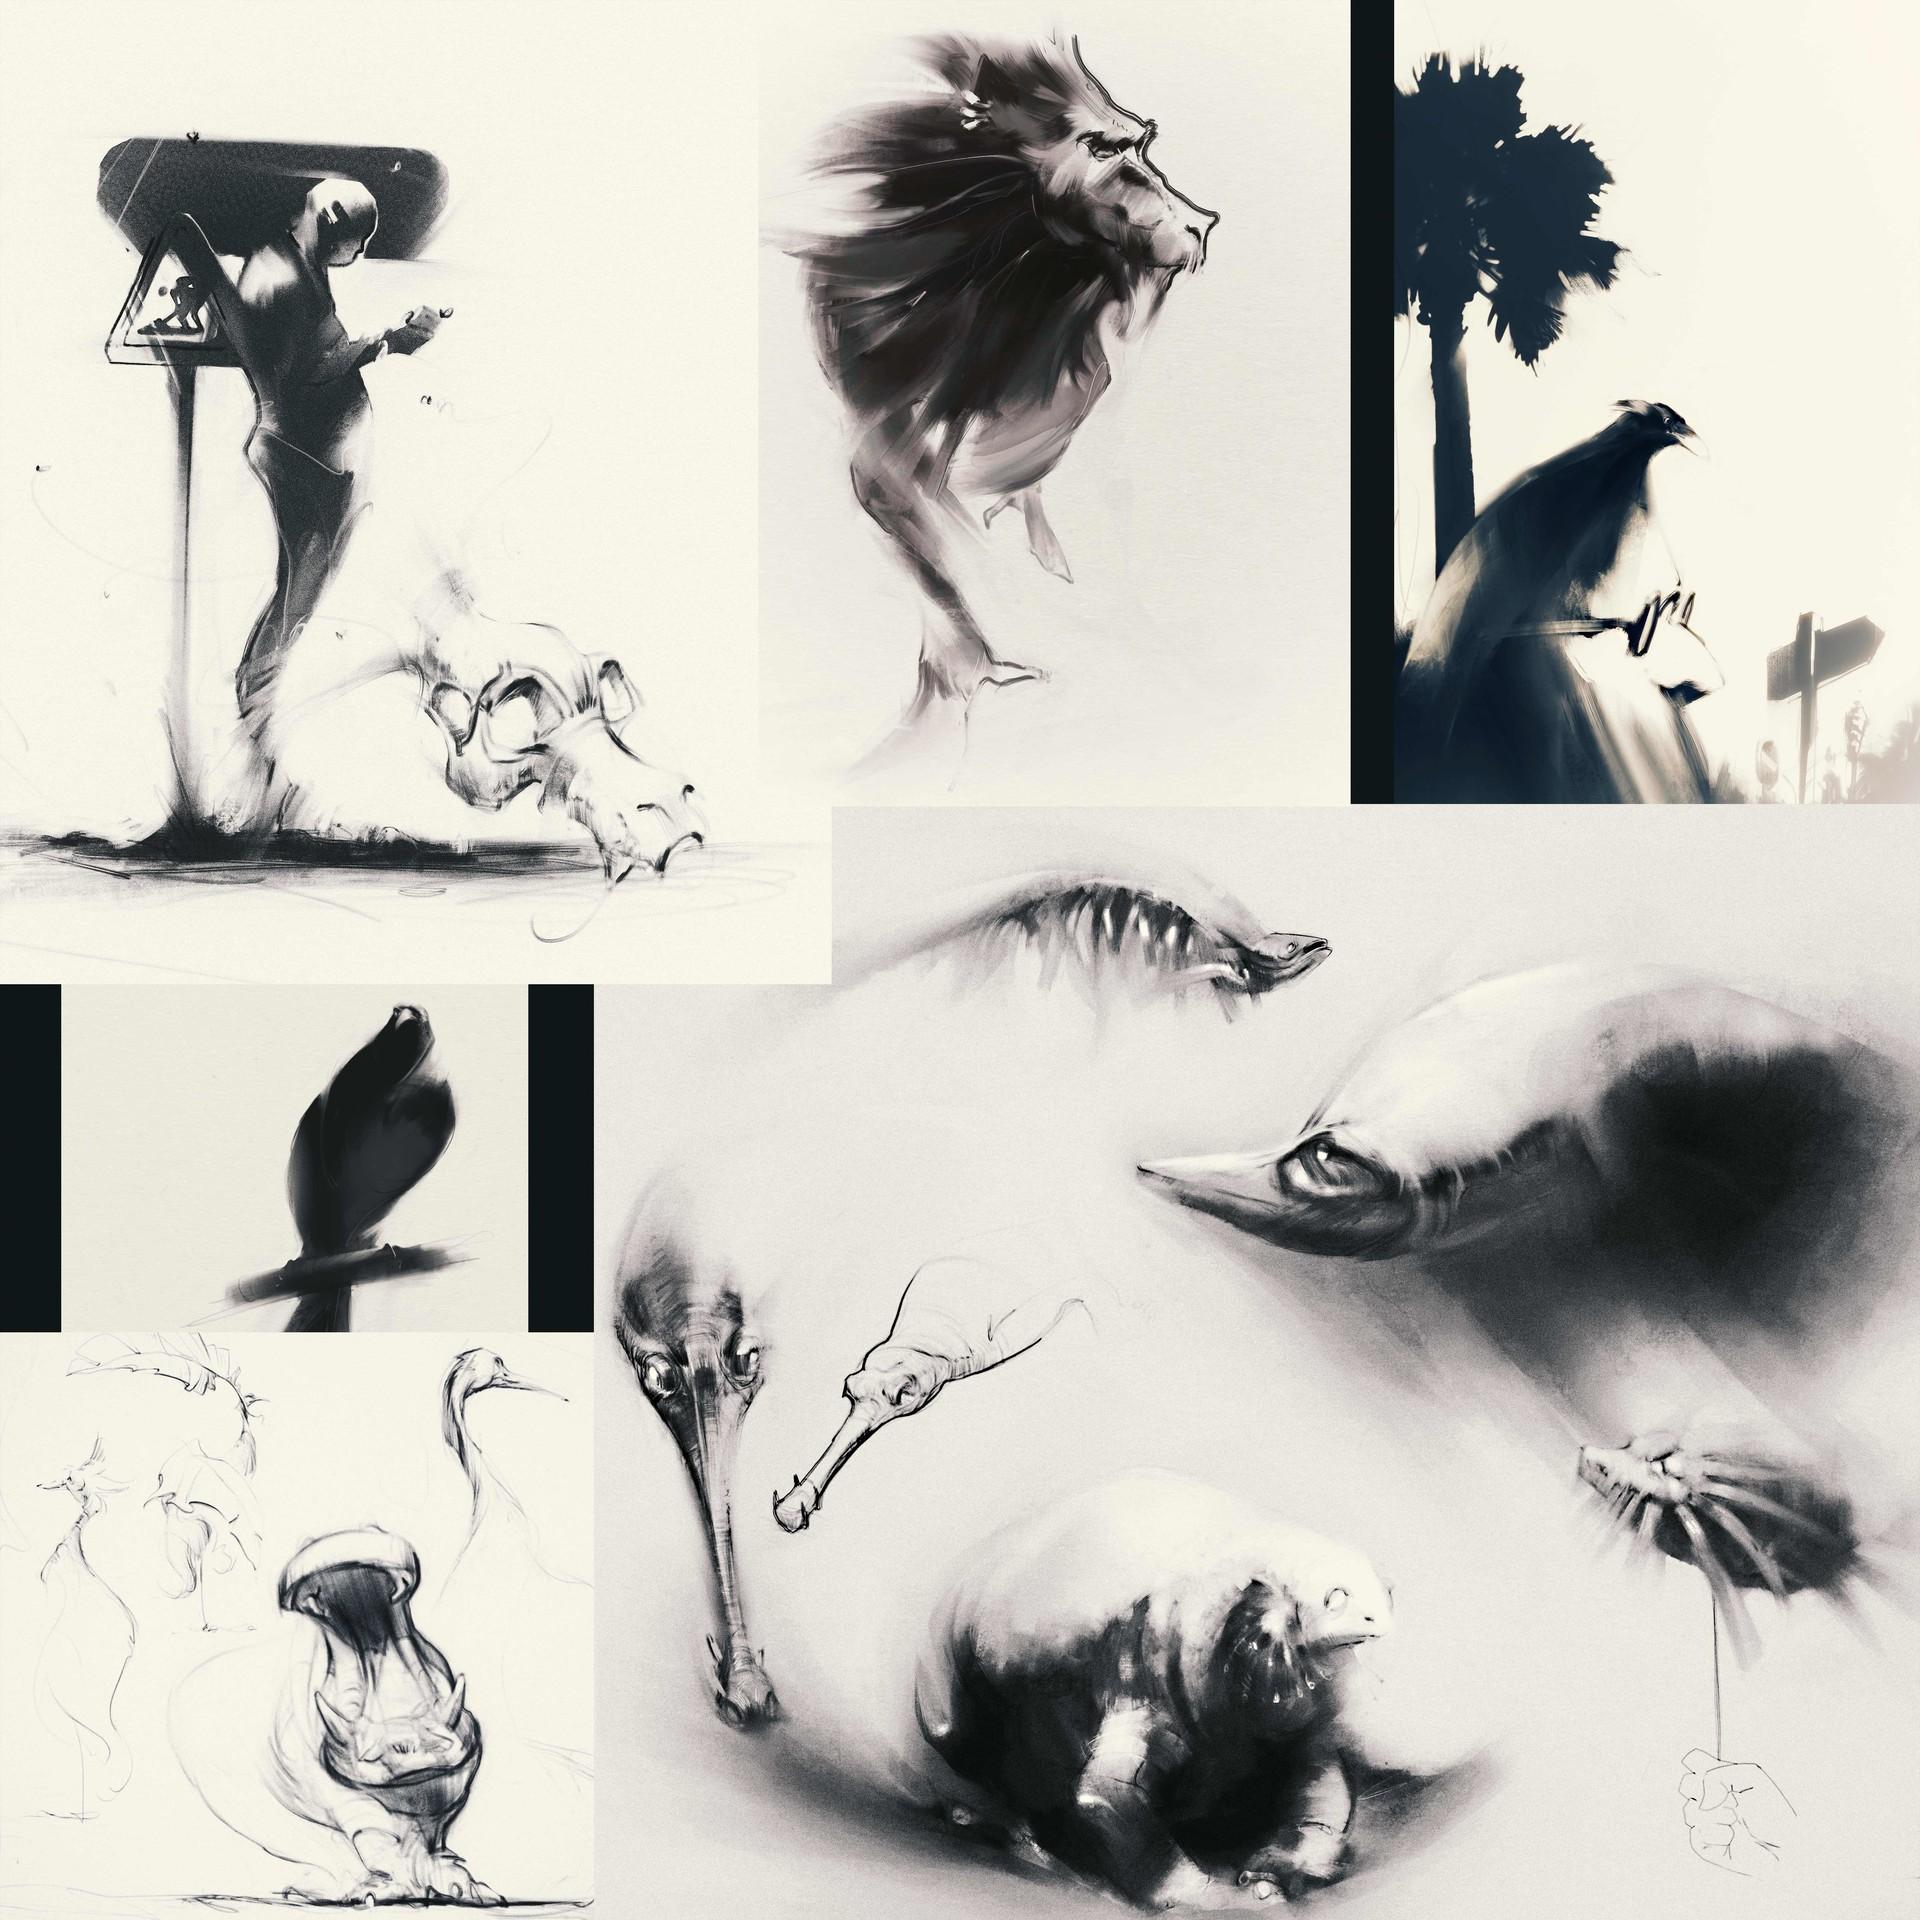 arash-razavi-snapshot1a